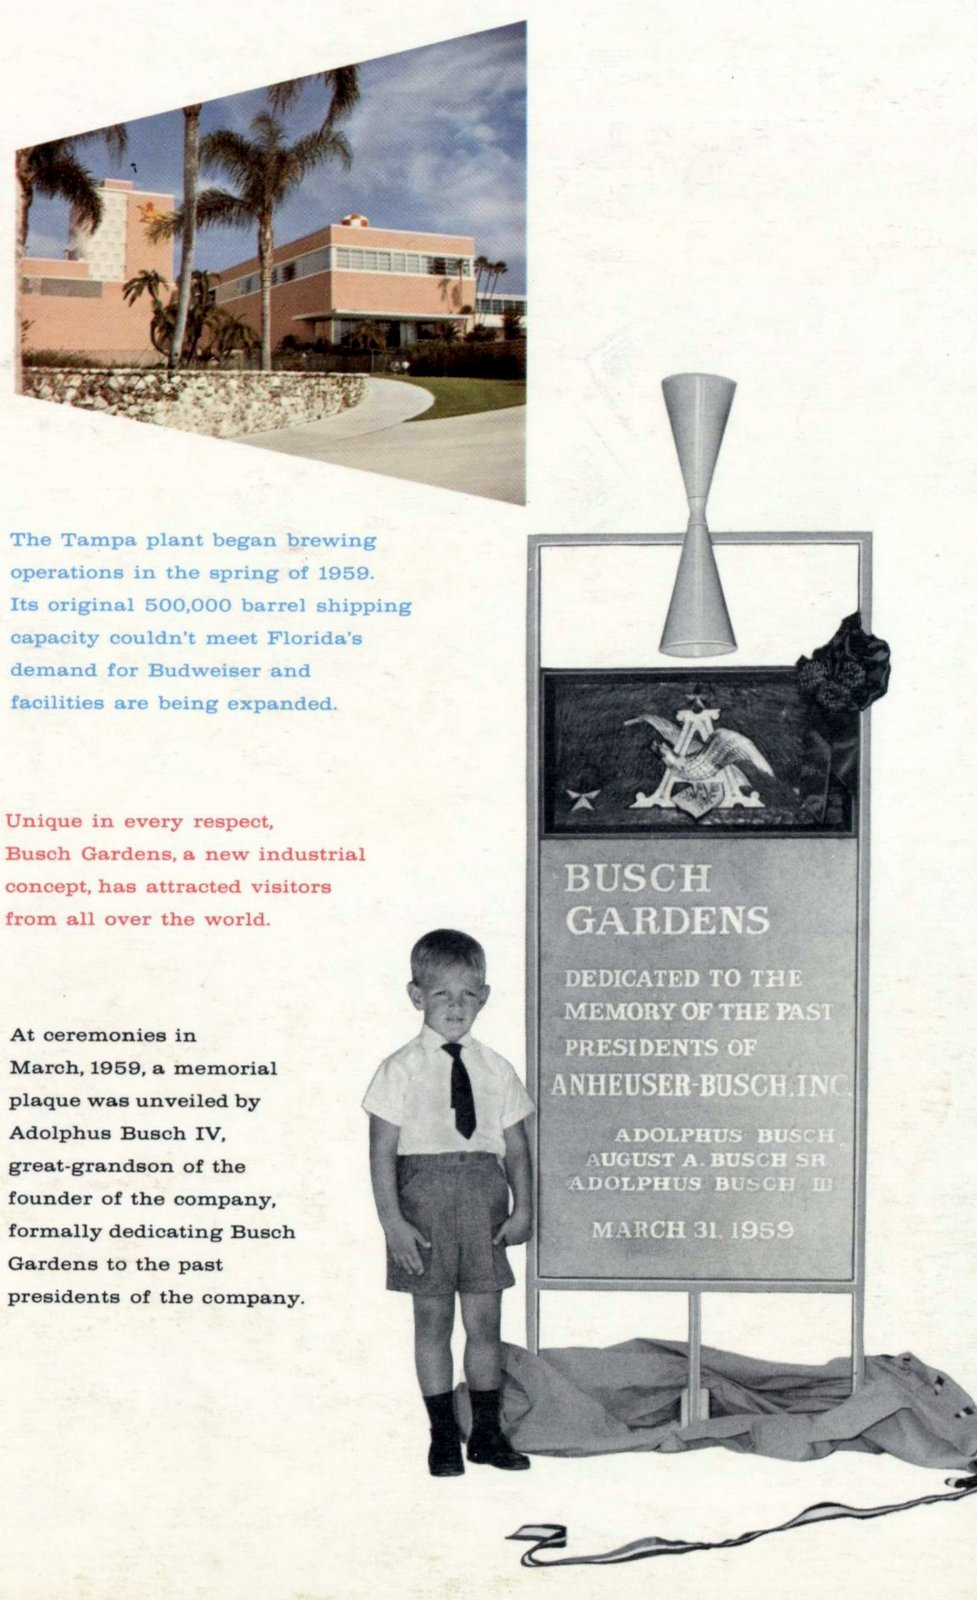 Dedication of Busch Gardens in Tampa Florida 1959